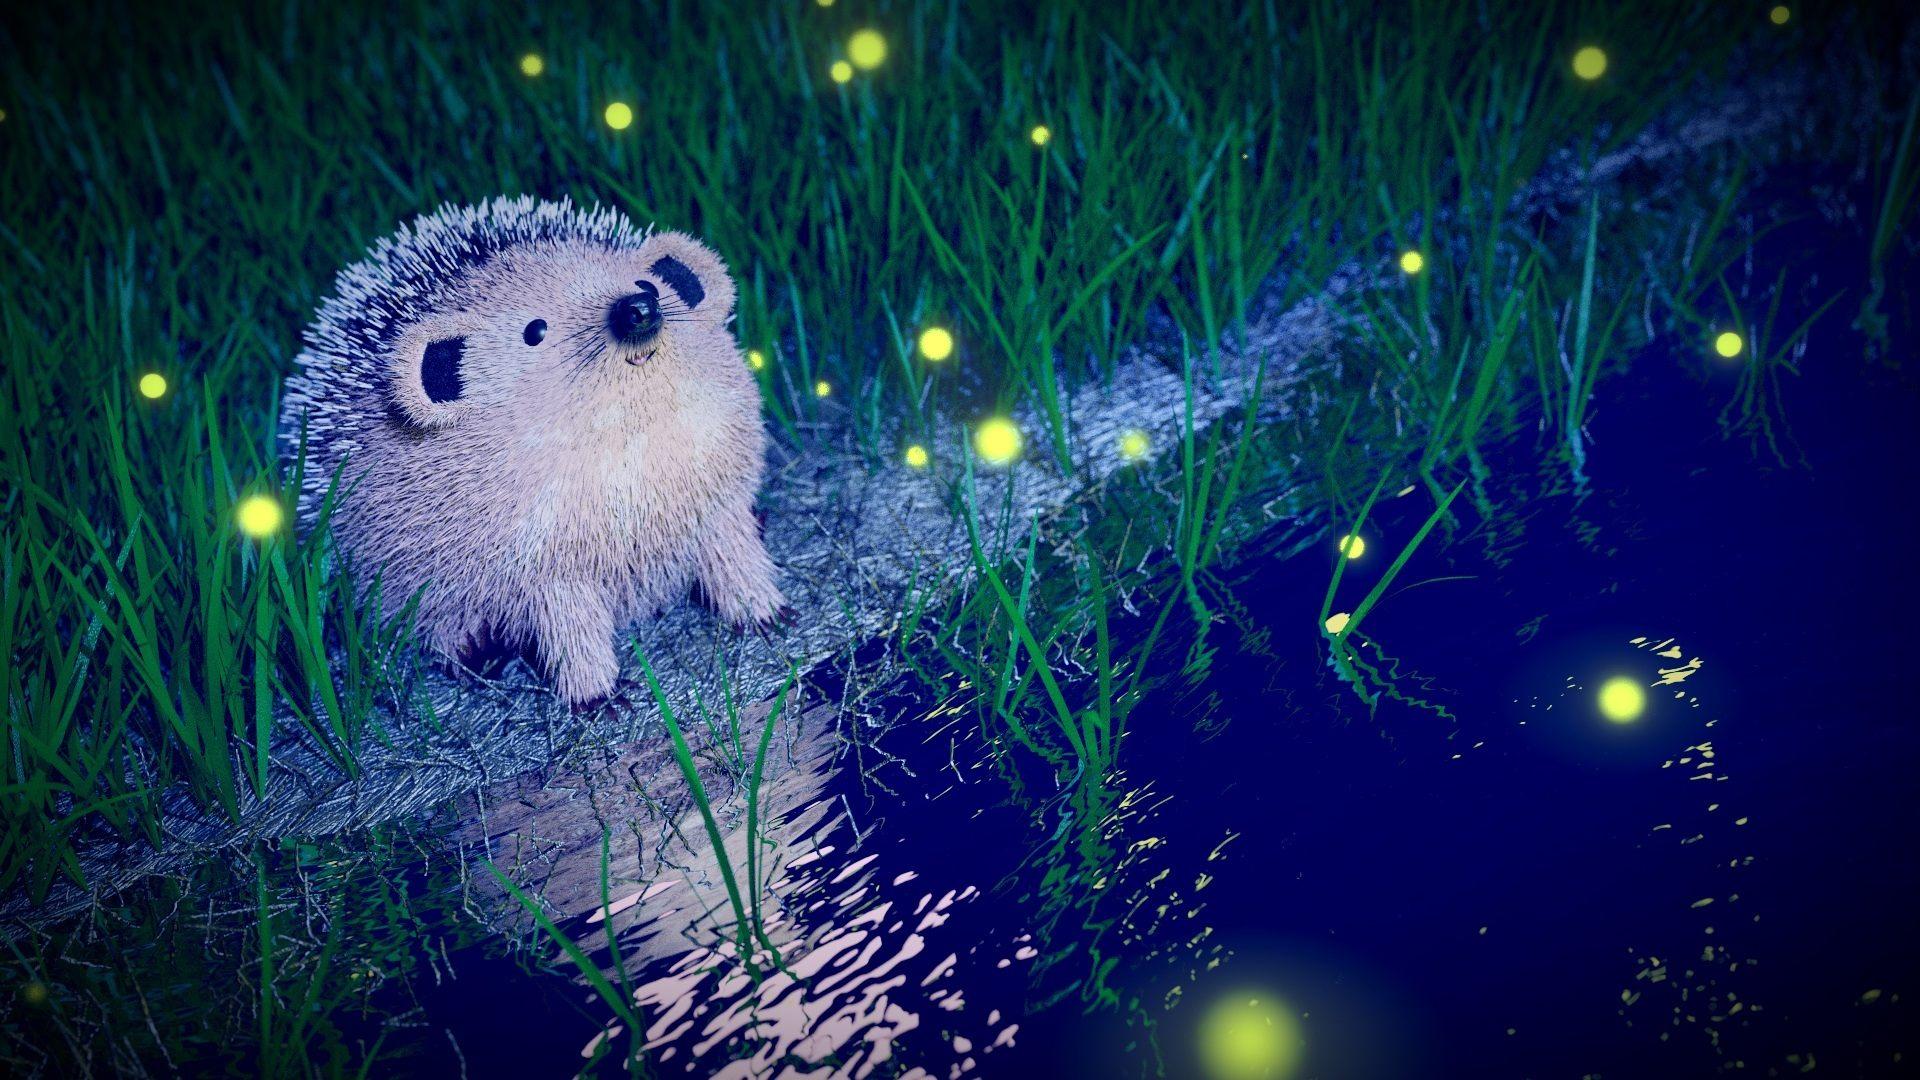 Cute Fireflies Wallpaper 1920x1080p Free Download Good Night With Hug 1920x1080 Wallpaper Teahub Io